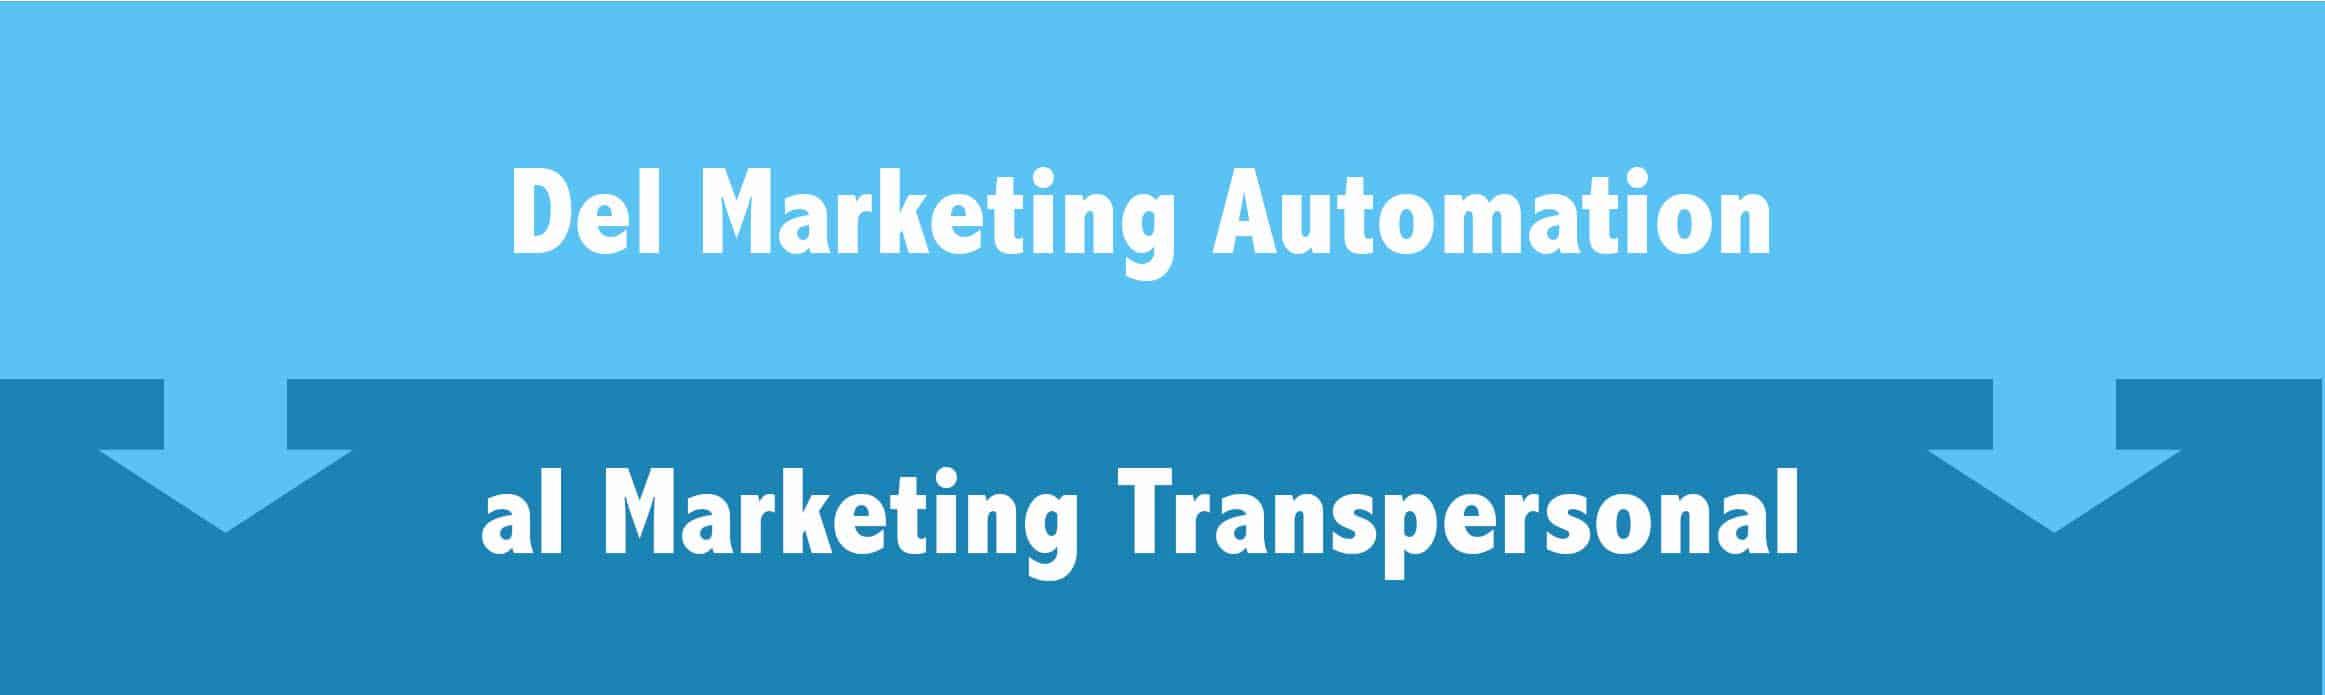 marketing automation y marketing transpersonal